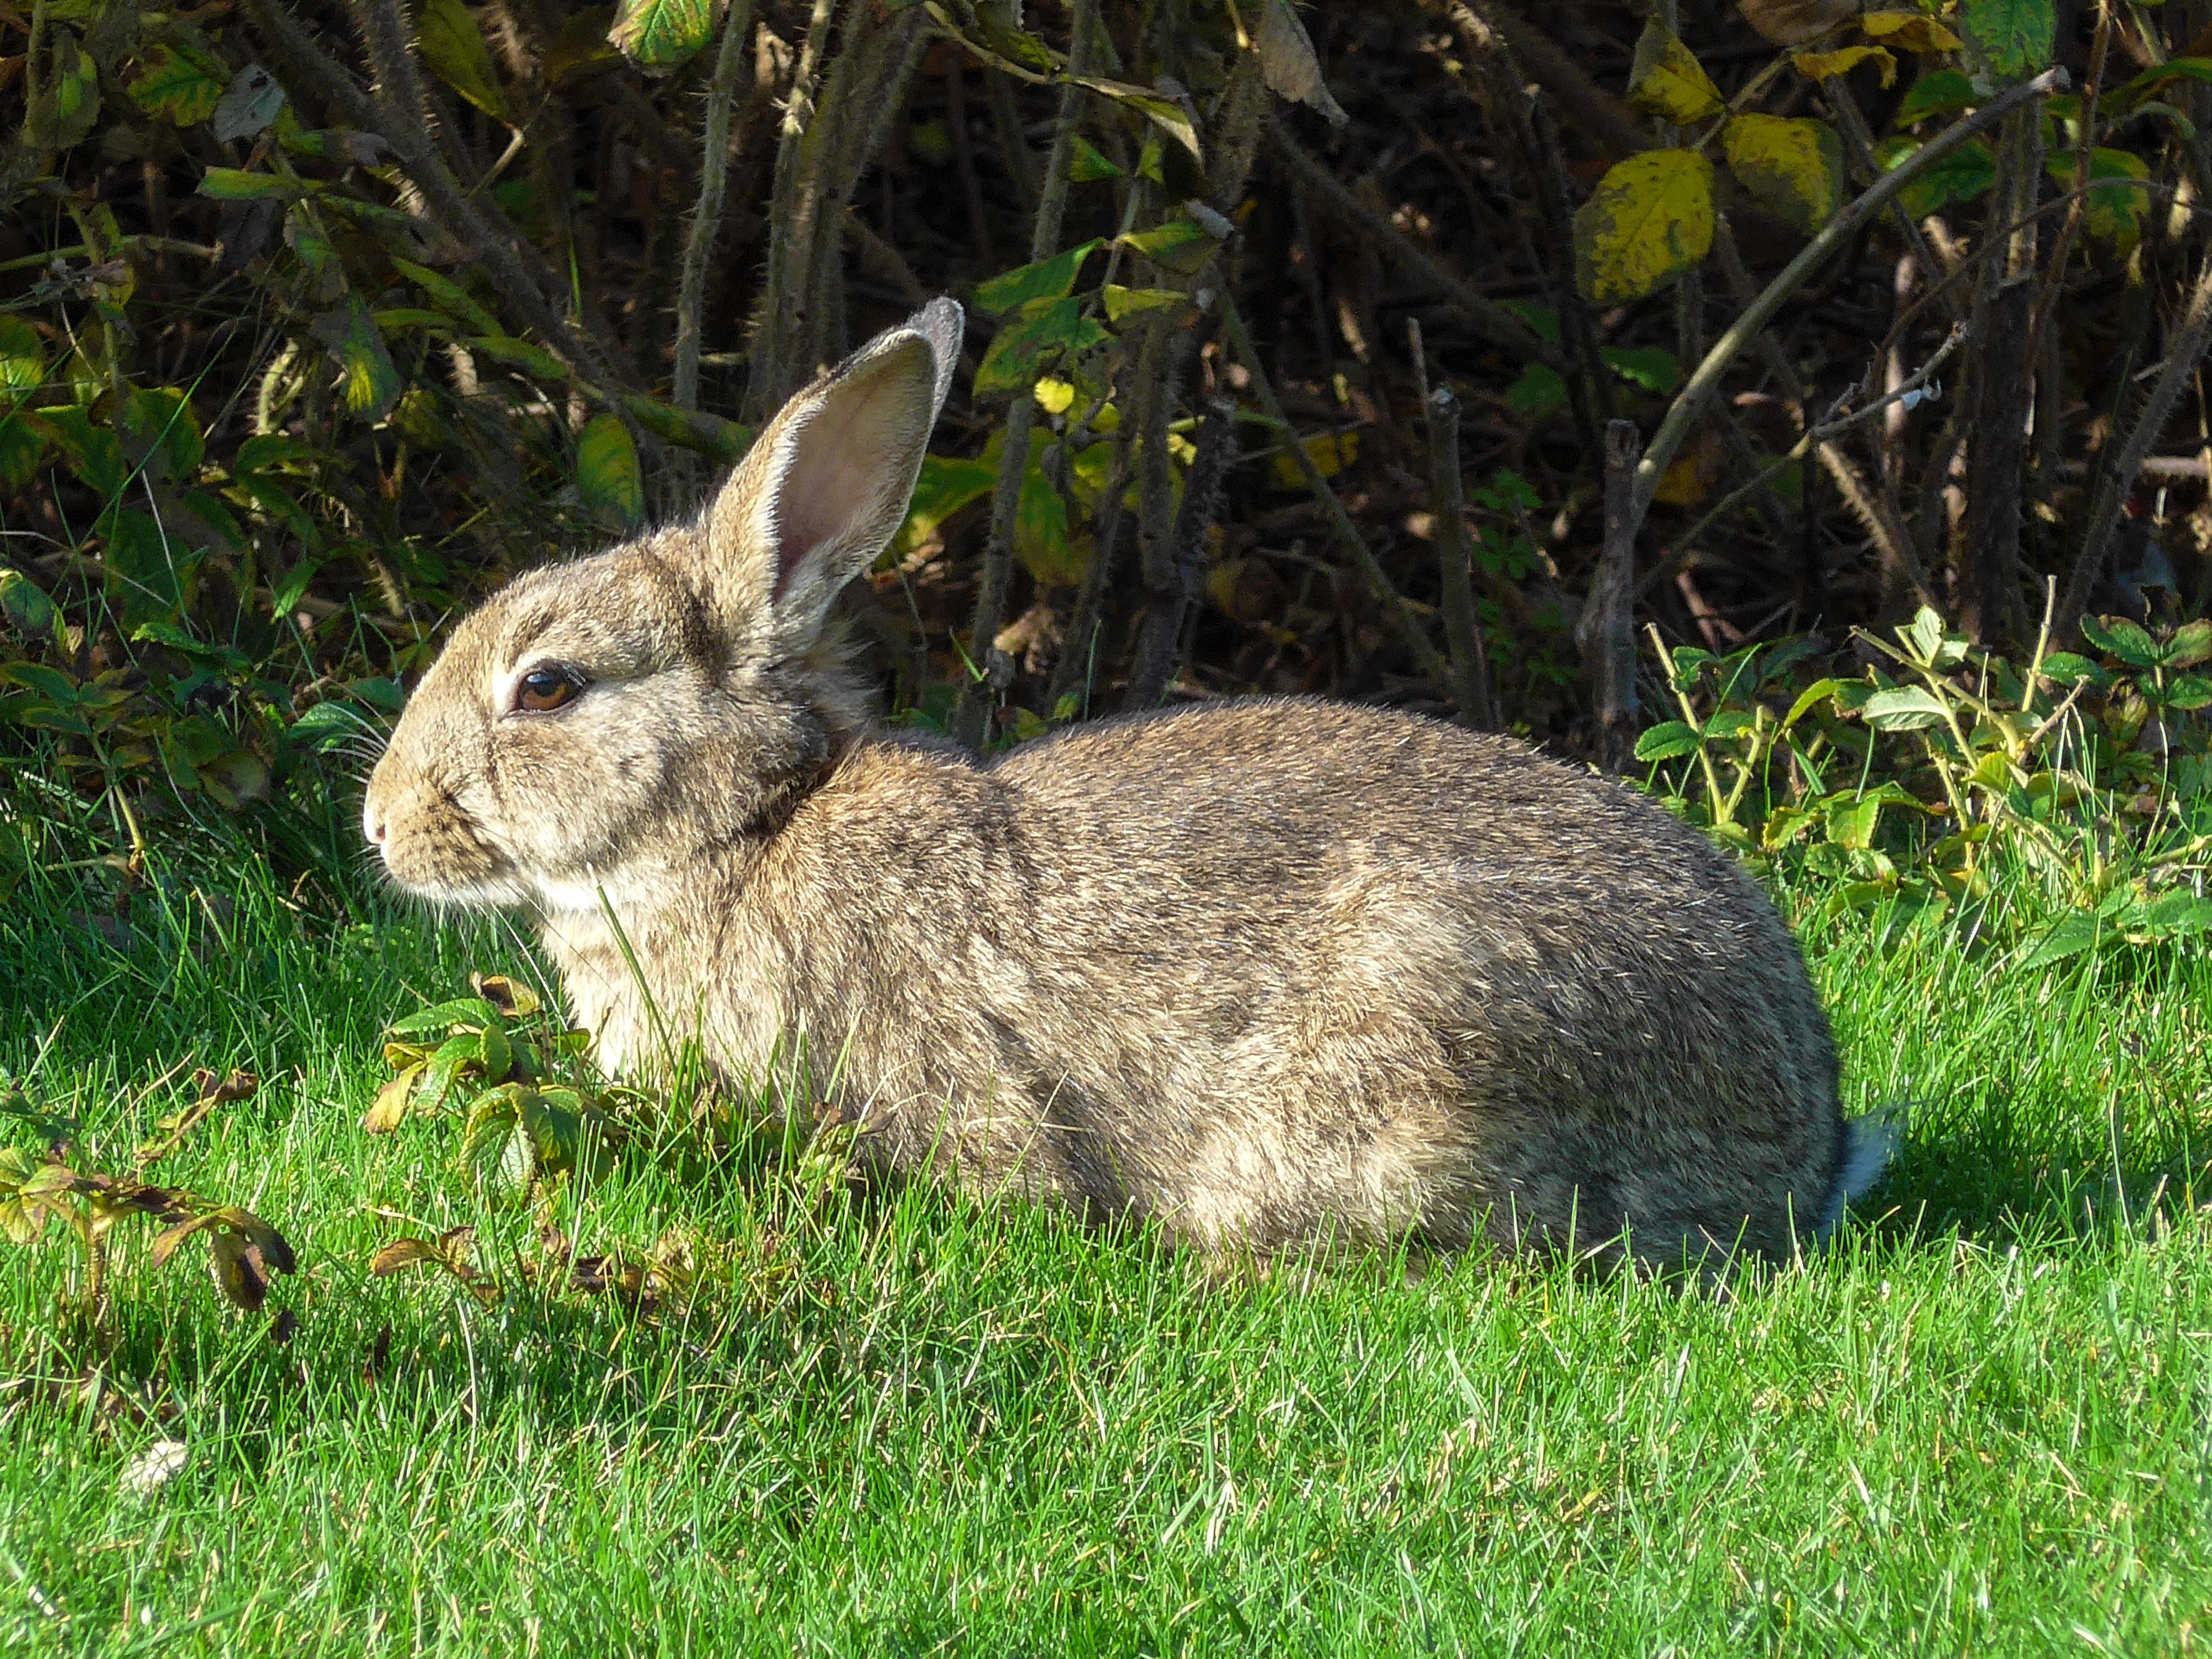 File:20141101 Wild konijn (Oryctolagus cuniculus) Strandweg Nes Ameland Fr  NL.jpg - Wikimedia Commons